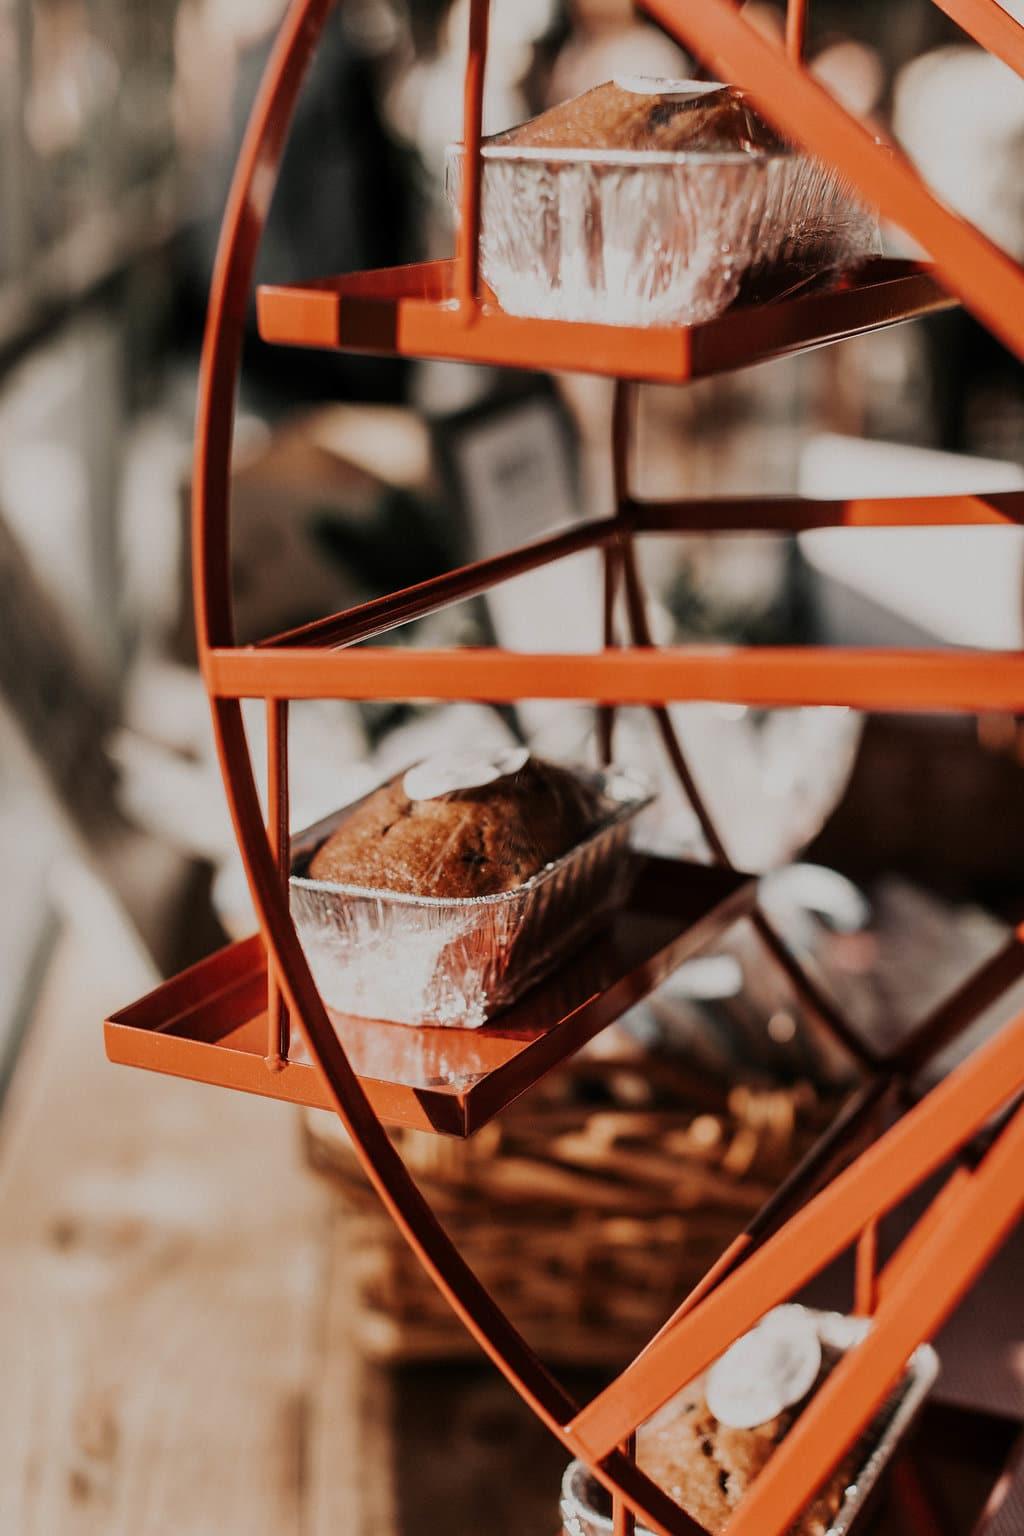 Smashing-Pumpkin-Mini-Loaves-Sweet-Cheeks-10th-Anniversary-Country-Fair-Amazonas-Photography-at-lomas-SFCC-124.jpg